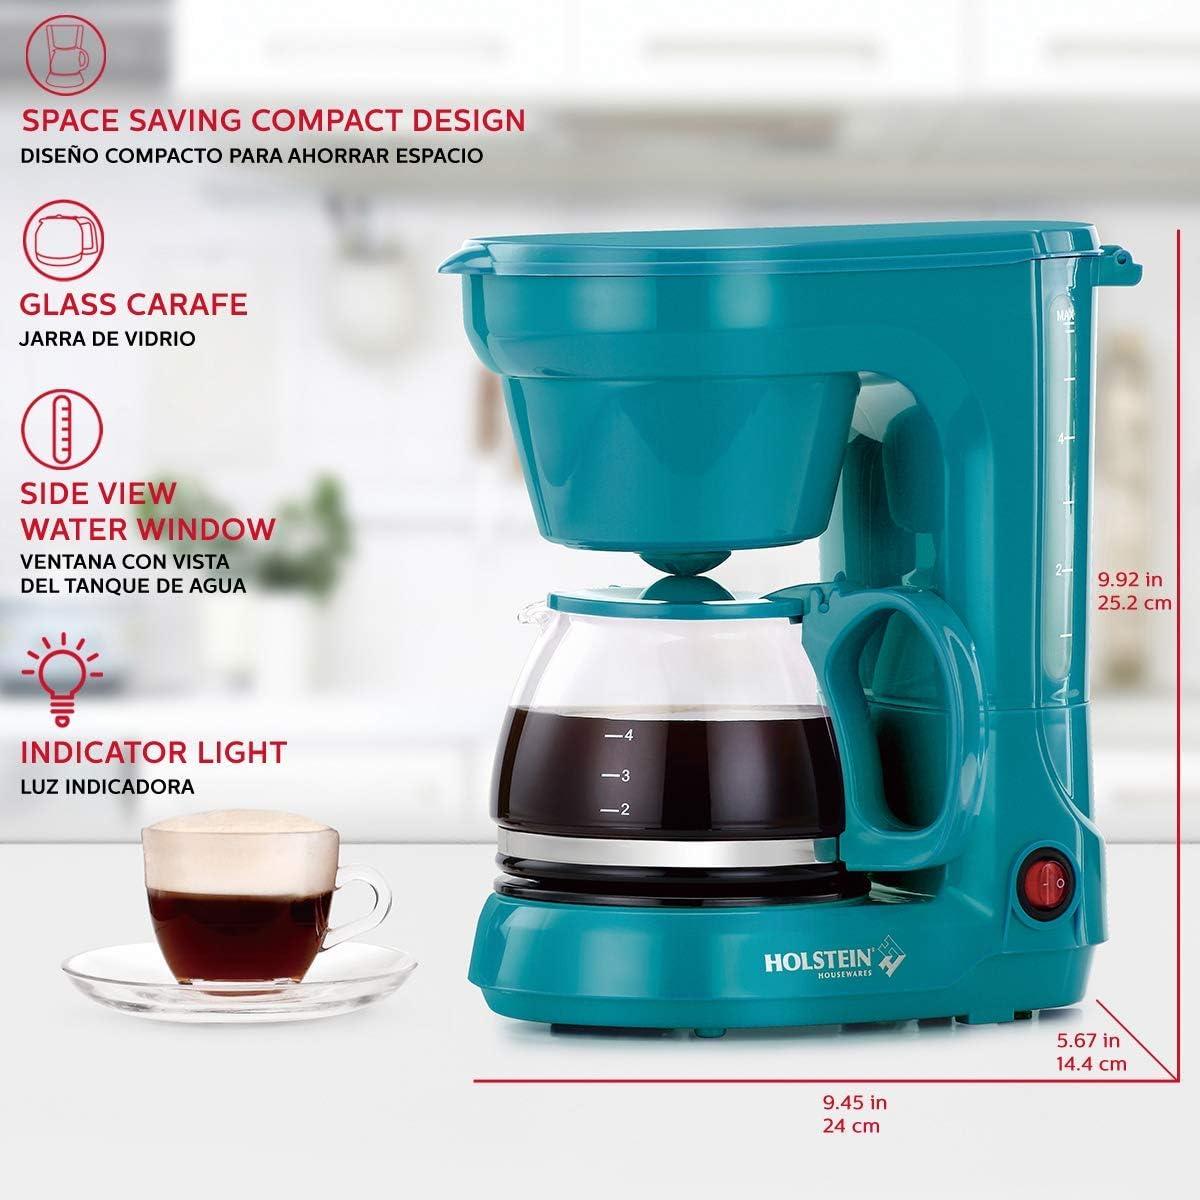 Mint Holstein Housewares HH-0914701I 5-Cup Coffee Maker 9.8x10x5.7